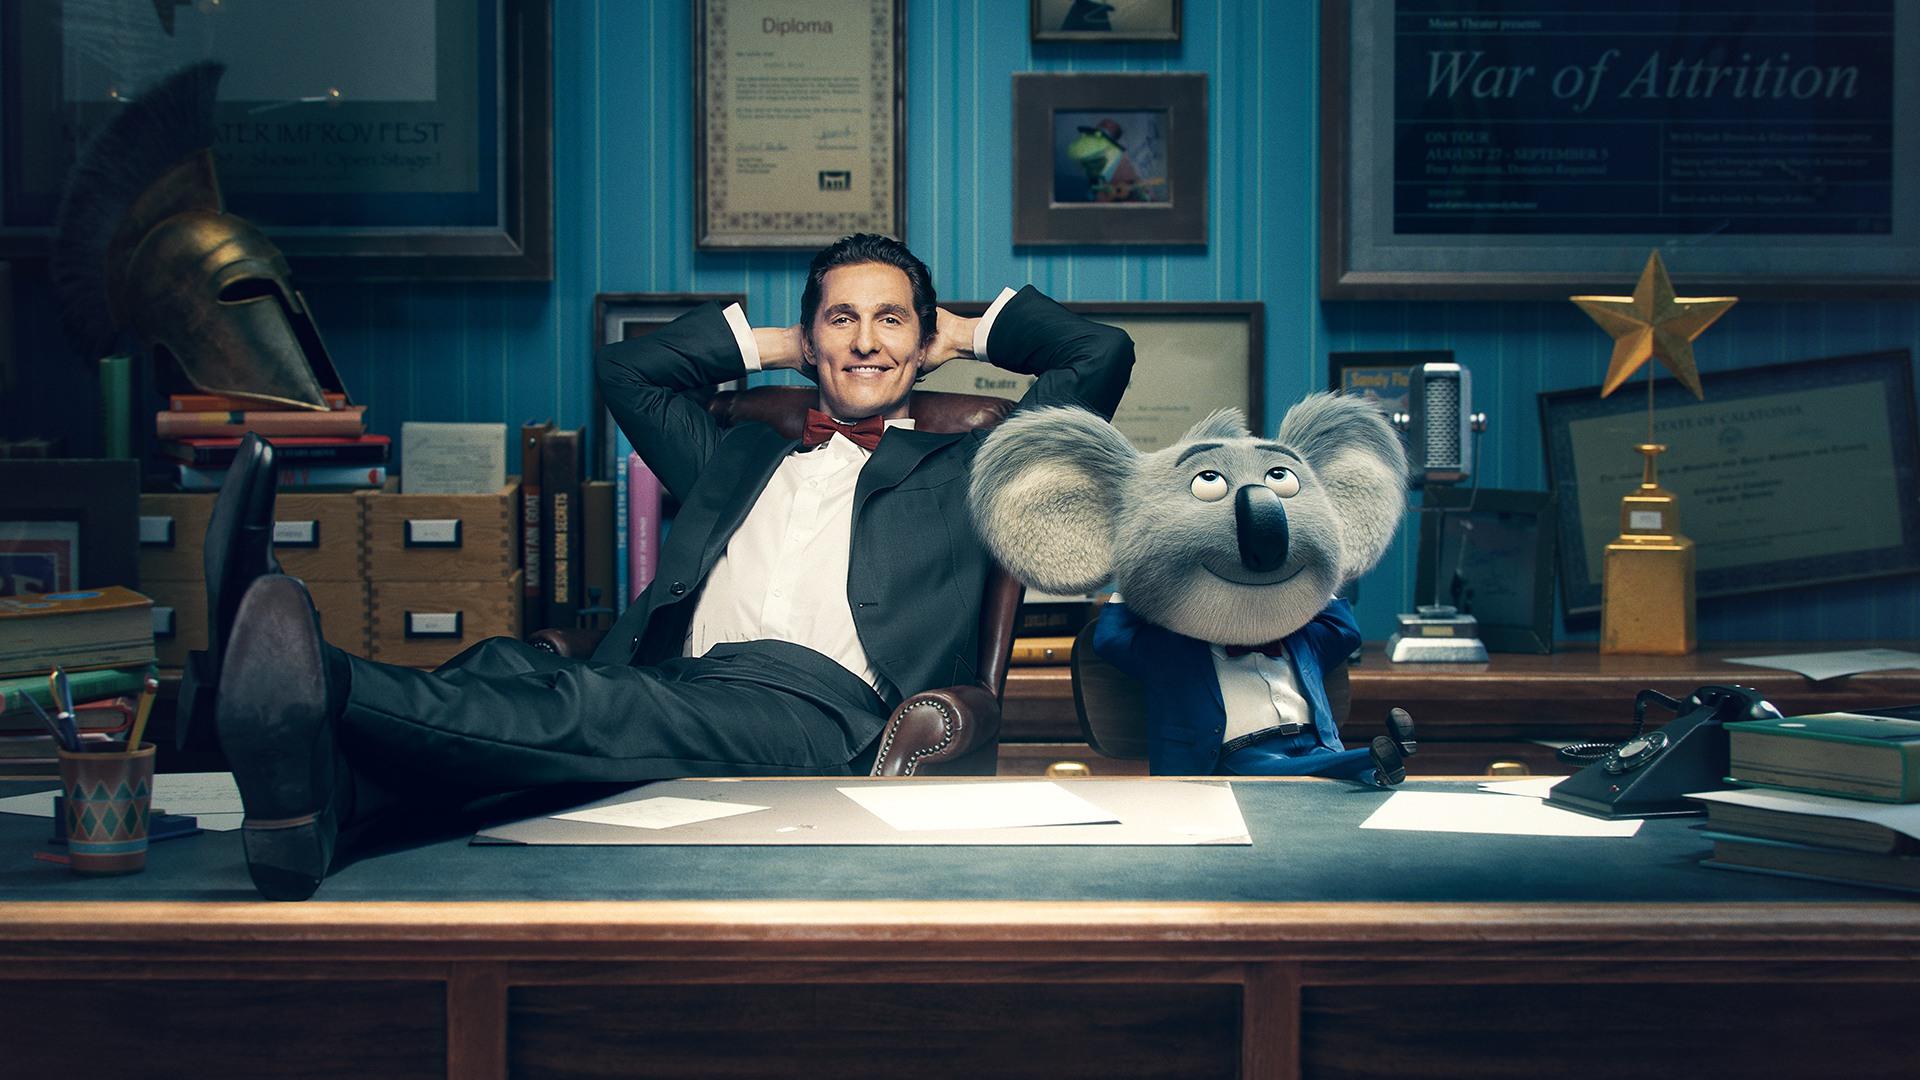 View Samegoogleiqdbsaucenao Matthew Mcconaughey As - Sing Cast With Character , HD Wallpaper & Backgrounds